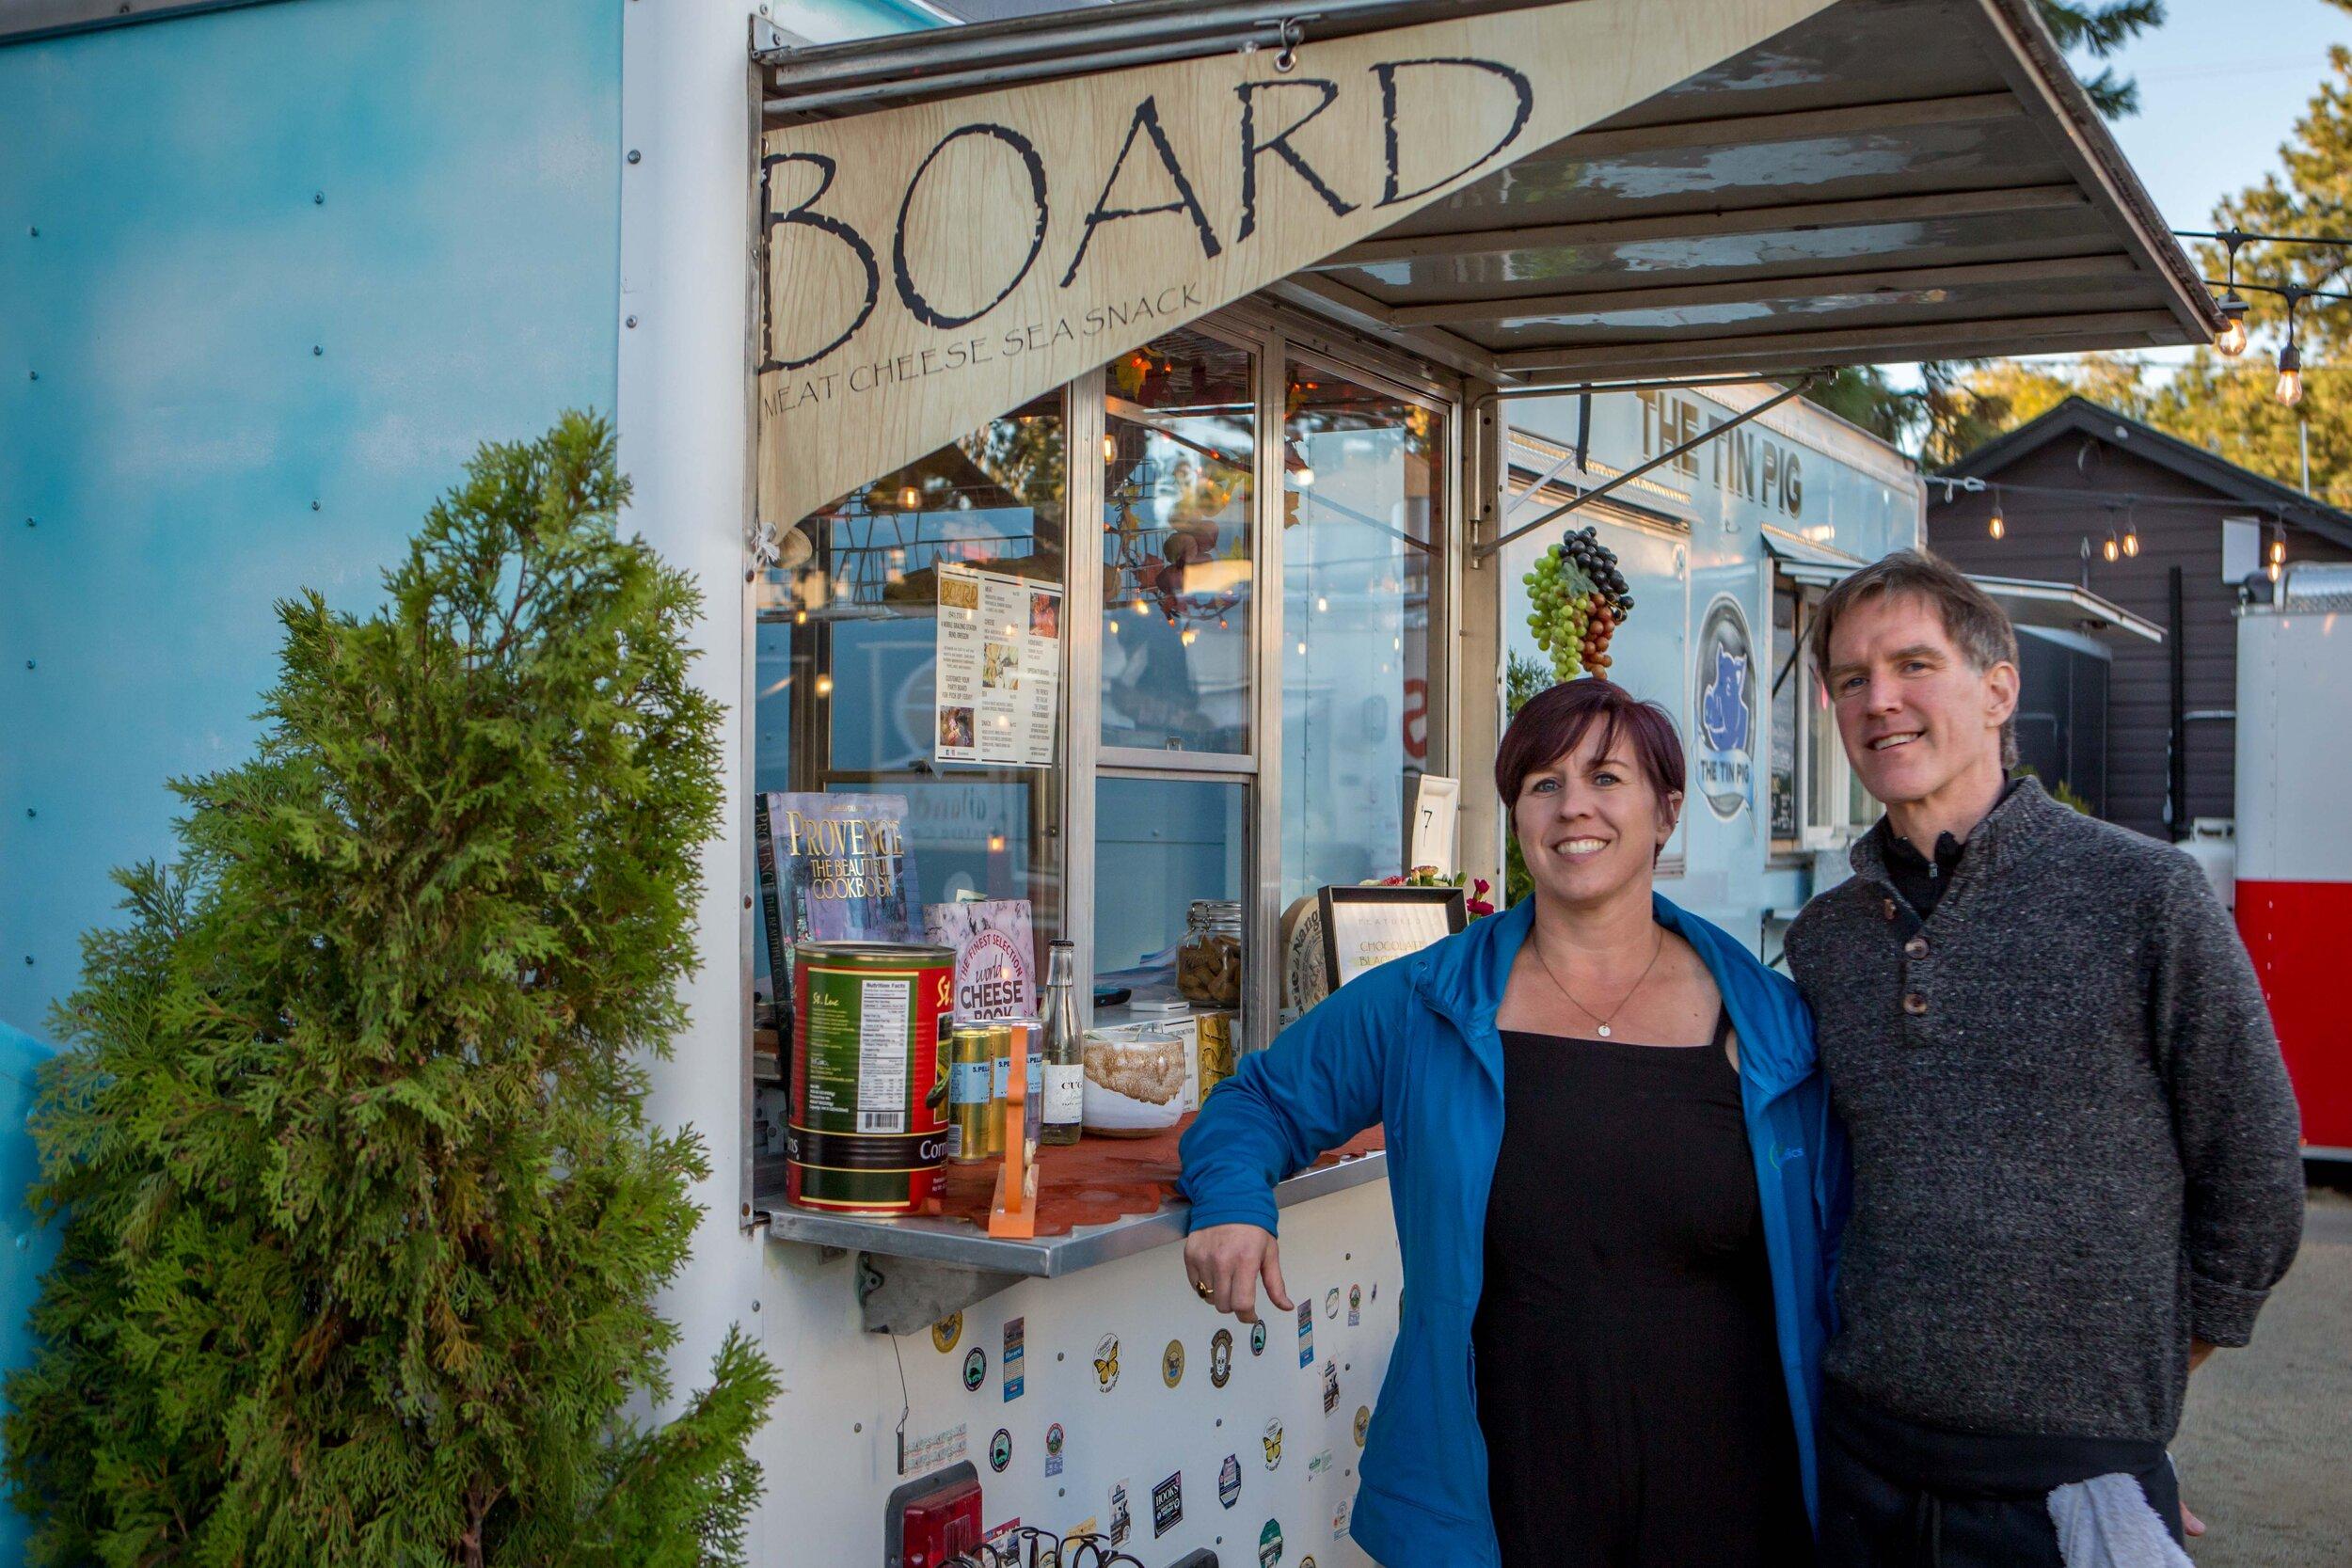 Board - Food Cart - The Podski